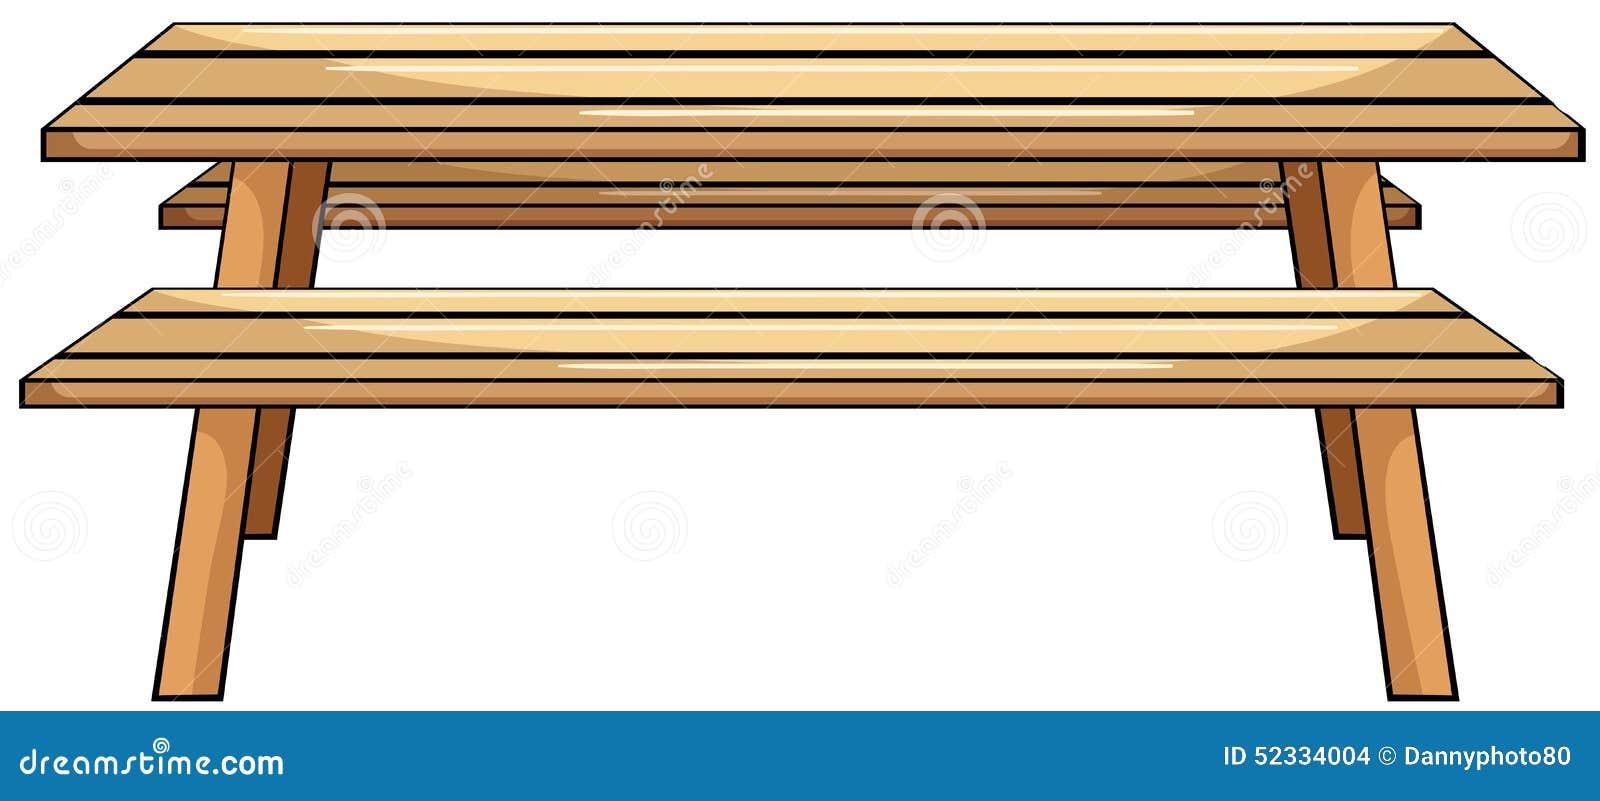 table de picnic elegant la r f rence en b nisterie cherche plan plan table de picnic with table. Black Bedroom Furniture Sets. Home Design Ideas